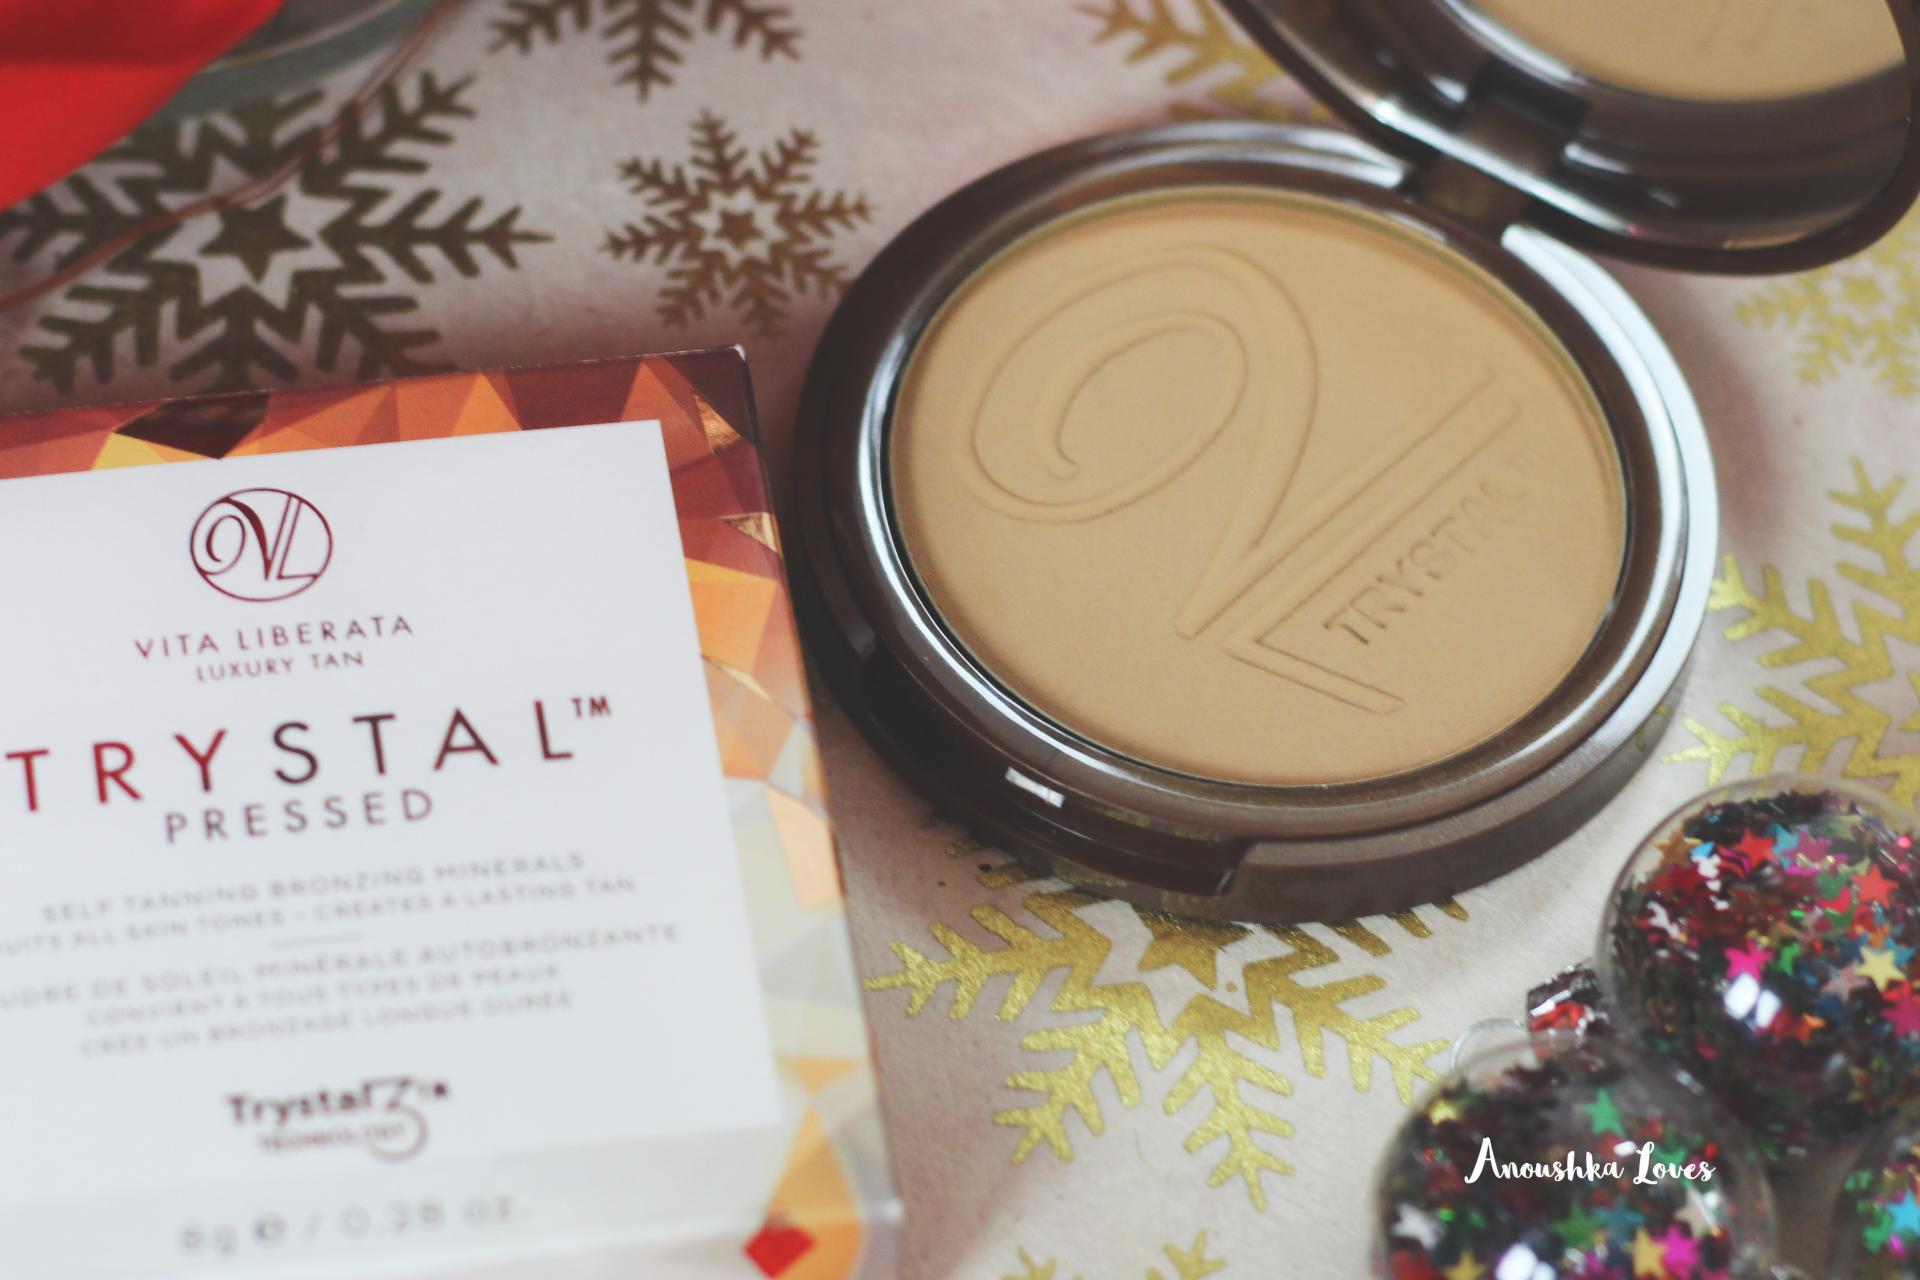 Festive Tanning with Vita Liberata